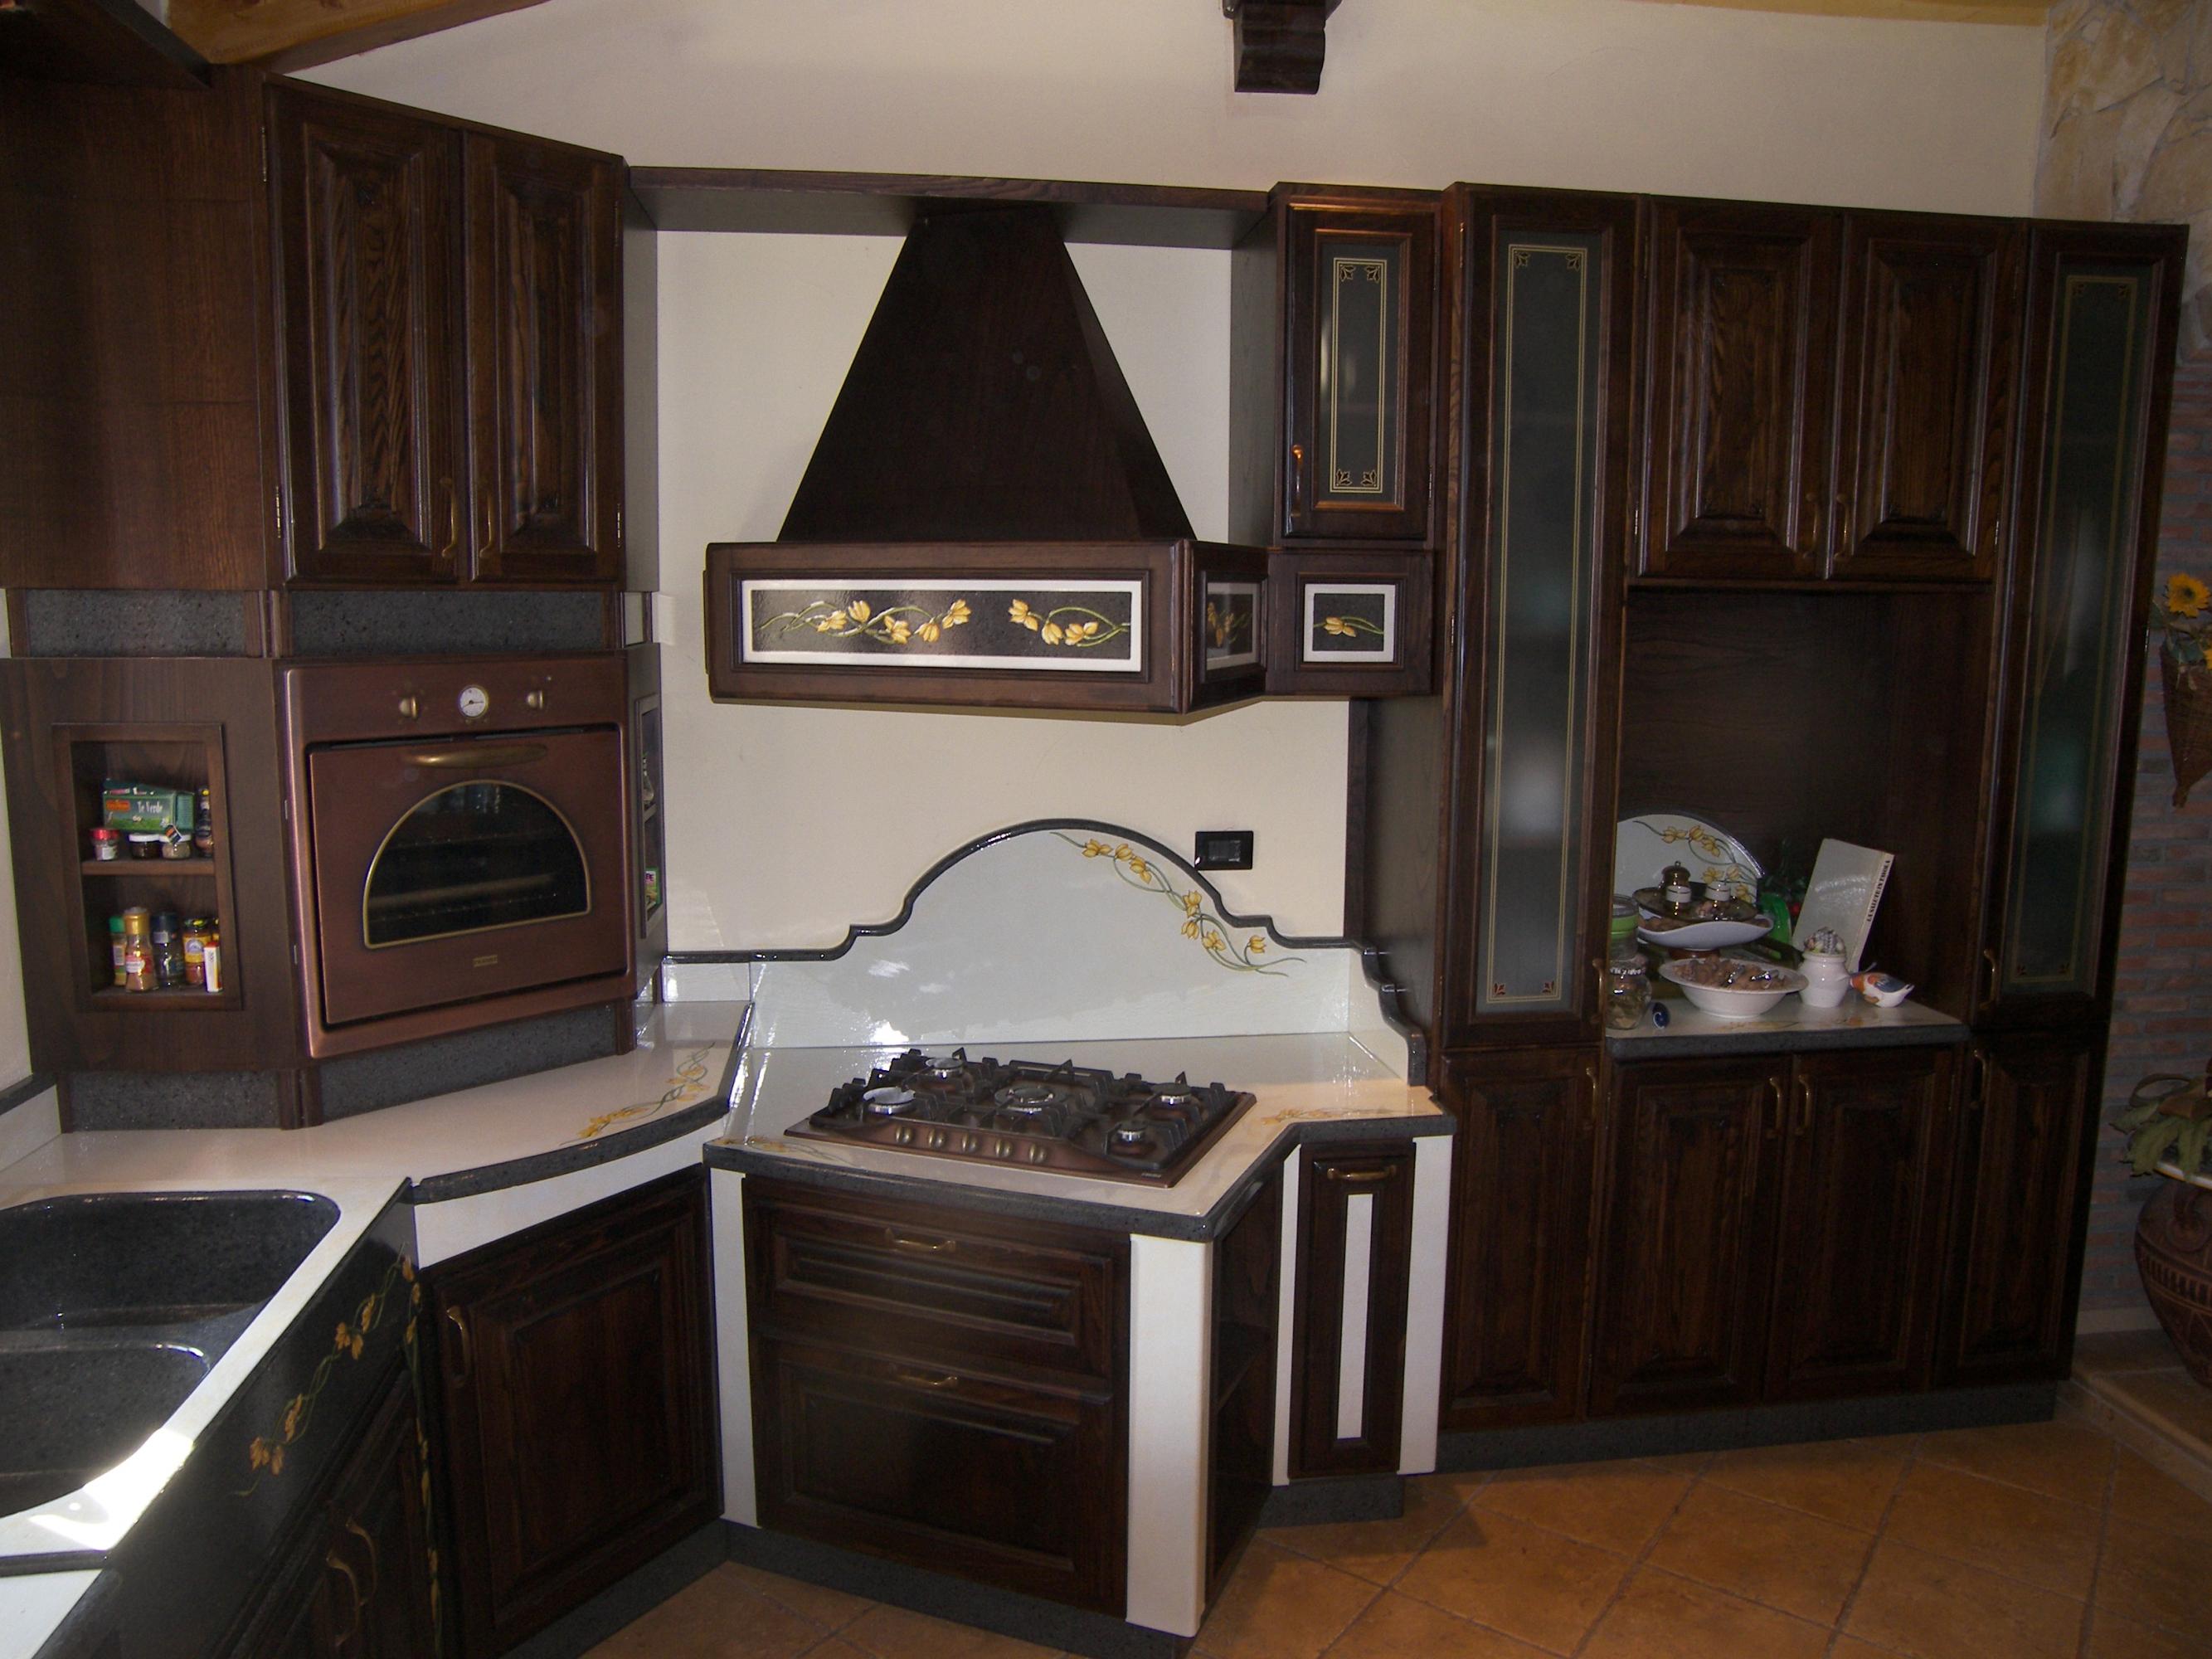 CUCINE DIIORIO - Arredamenti Cucine Siciliane